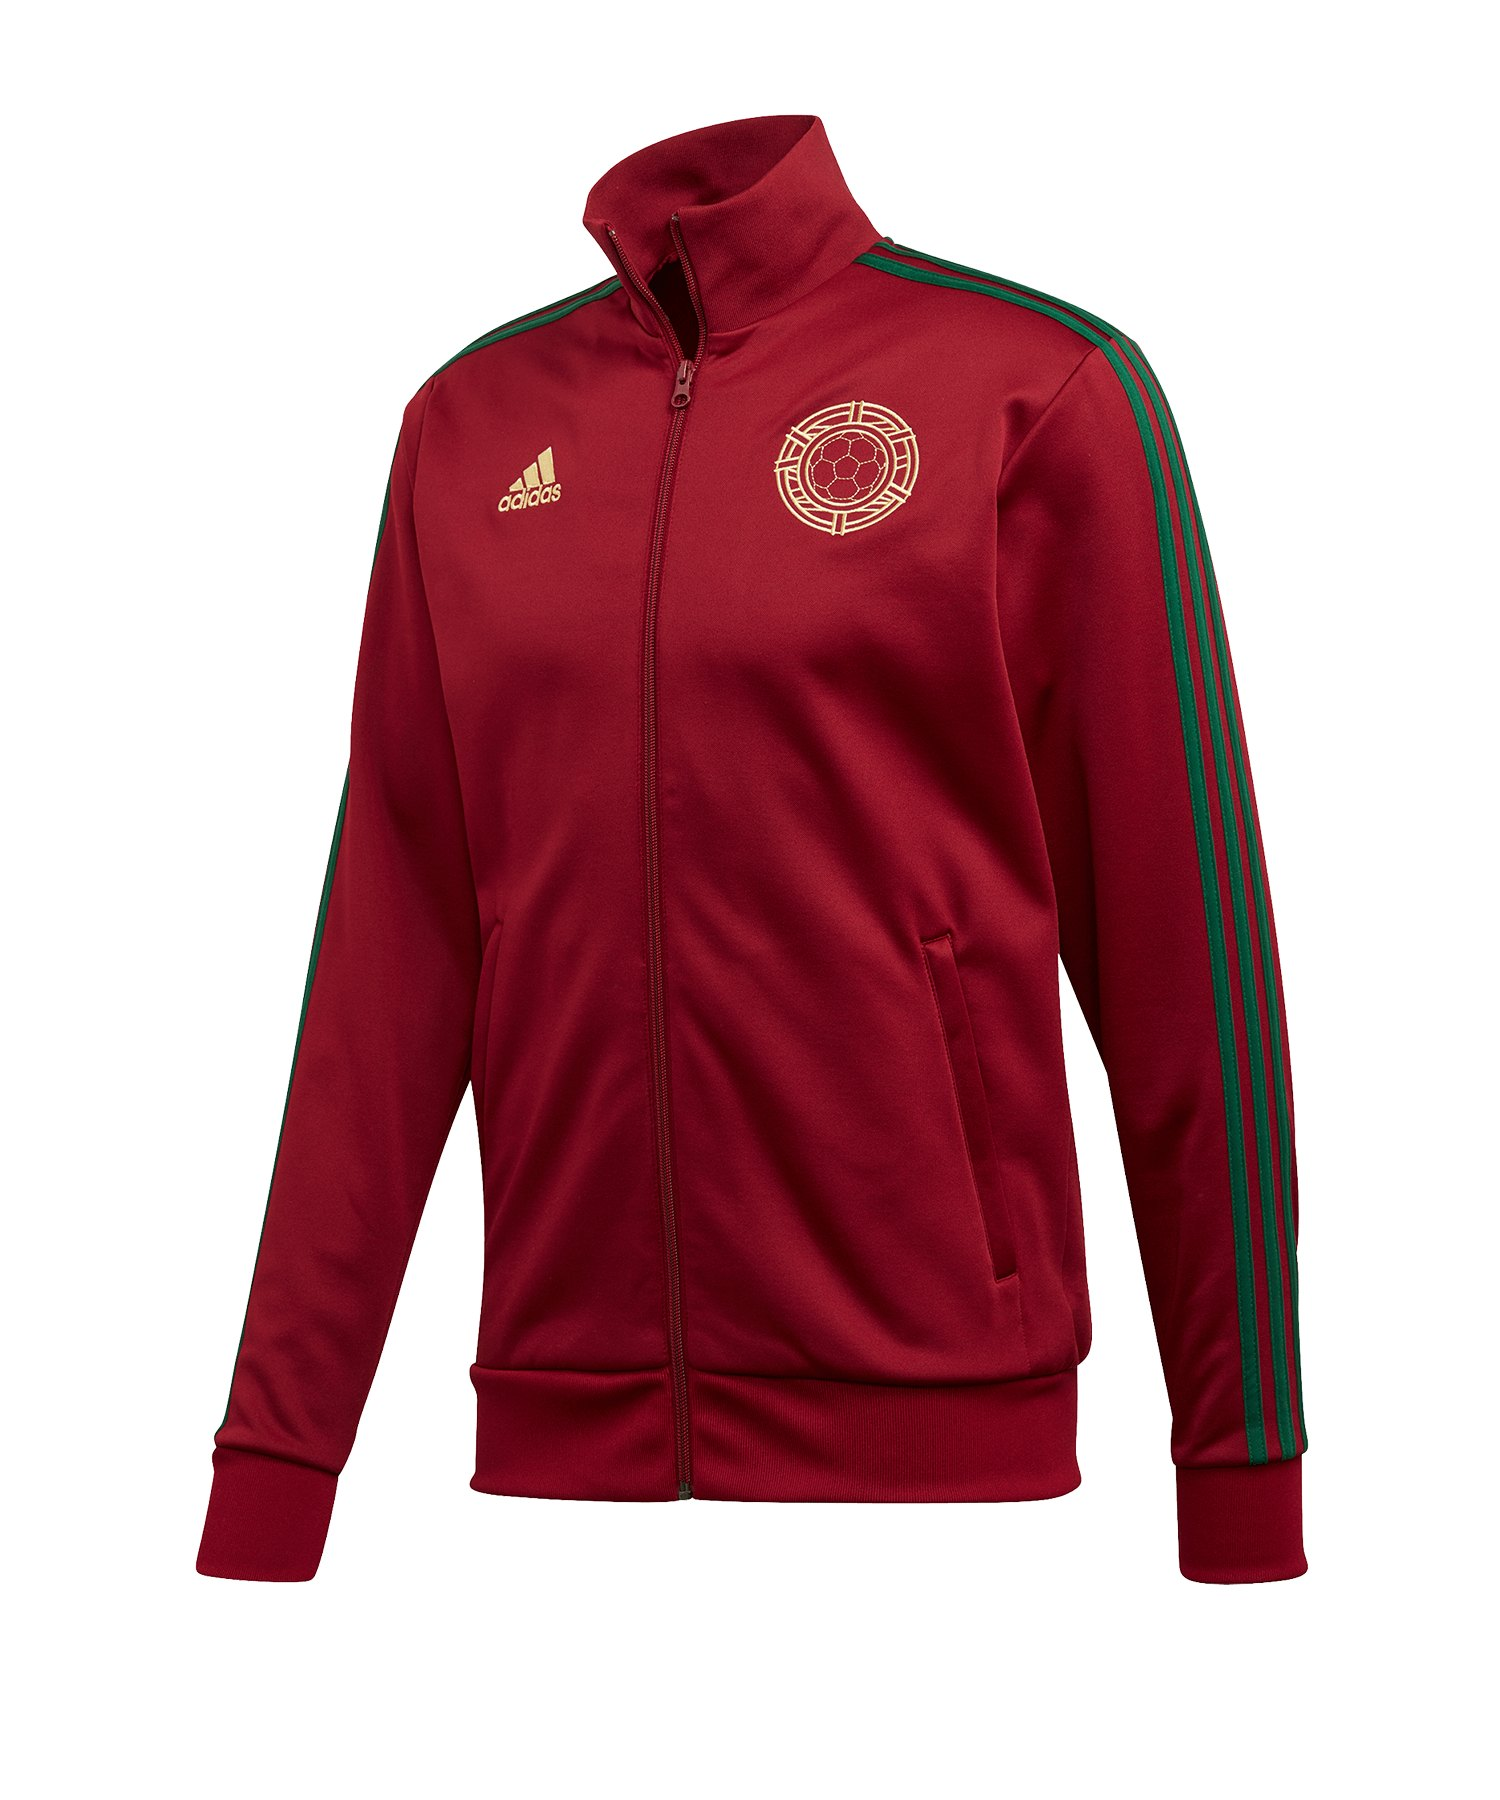 adidas Portugal Trainingsjacke Rot Grün - rot